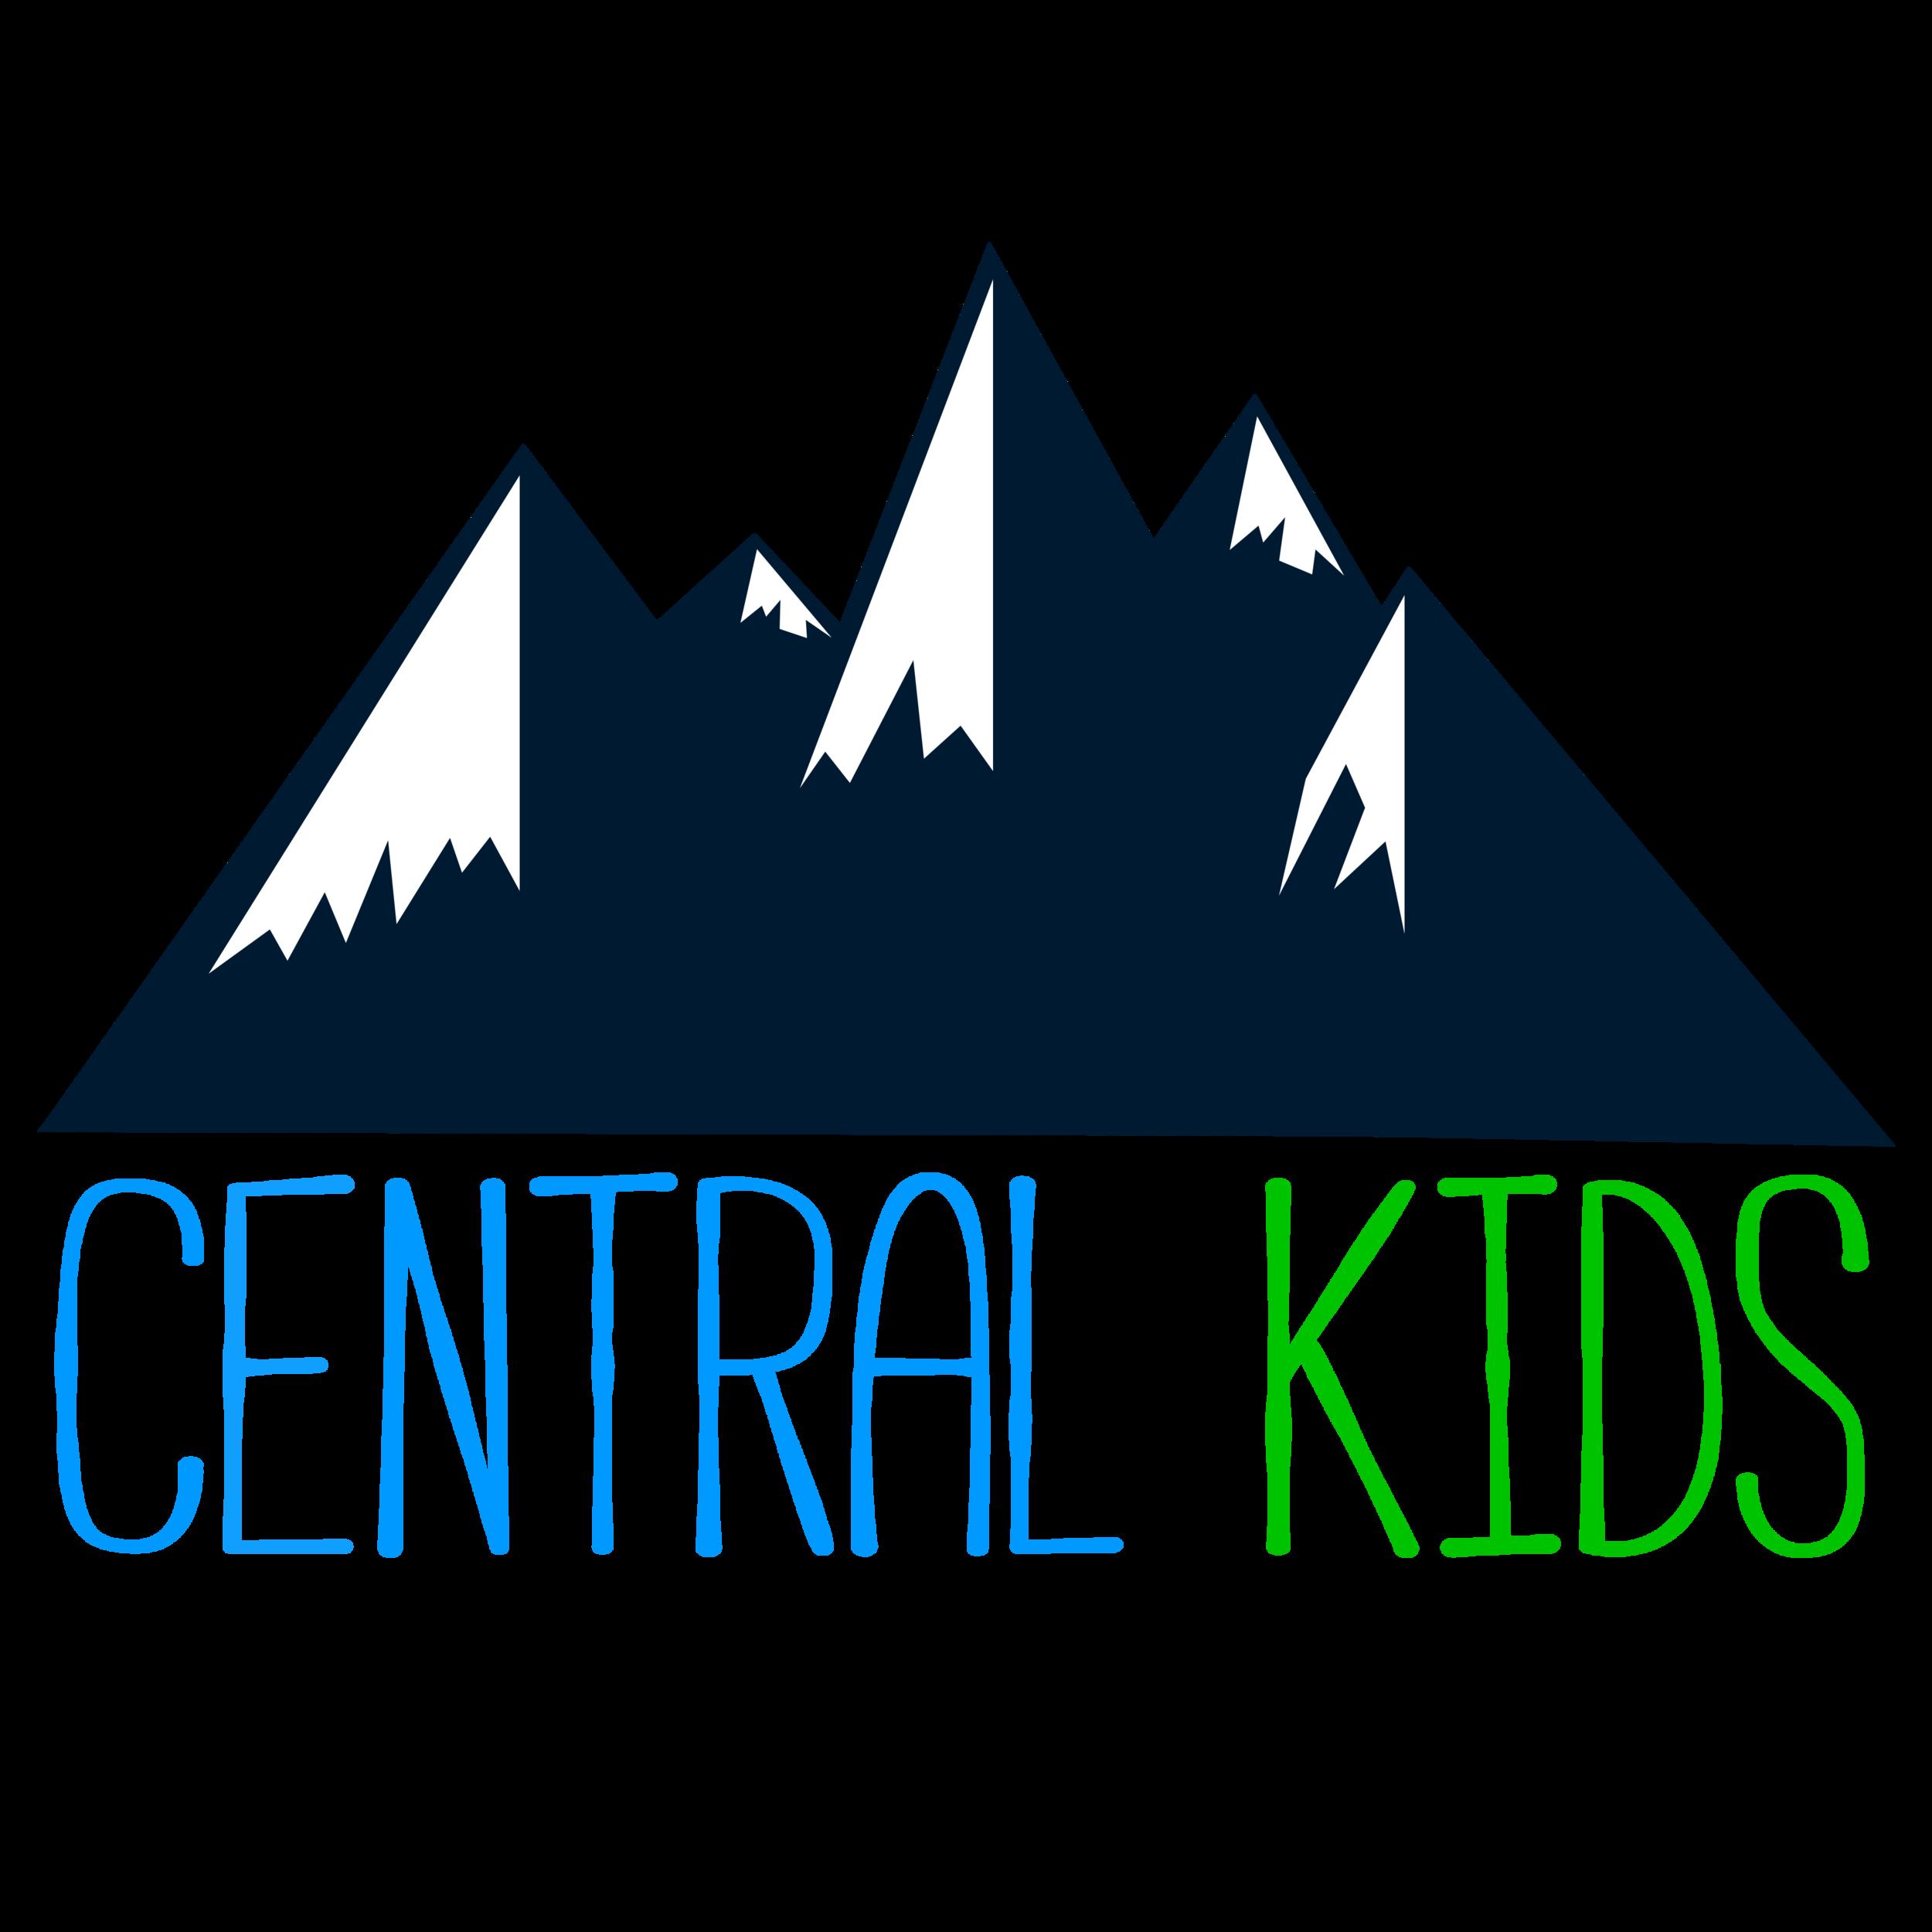 Central Kids.png